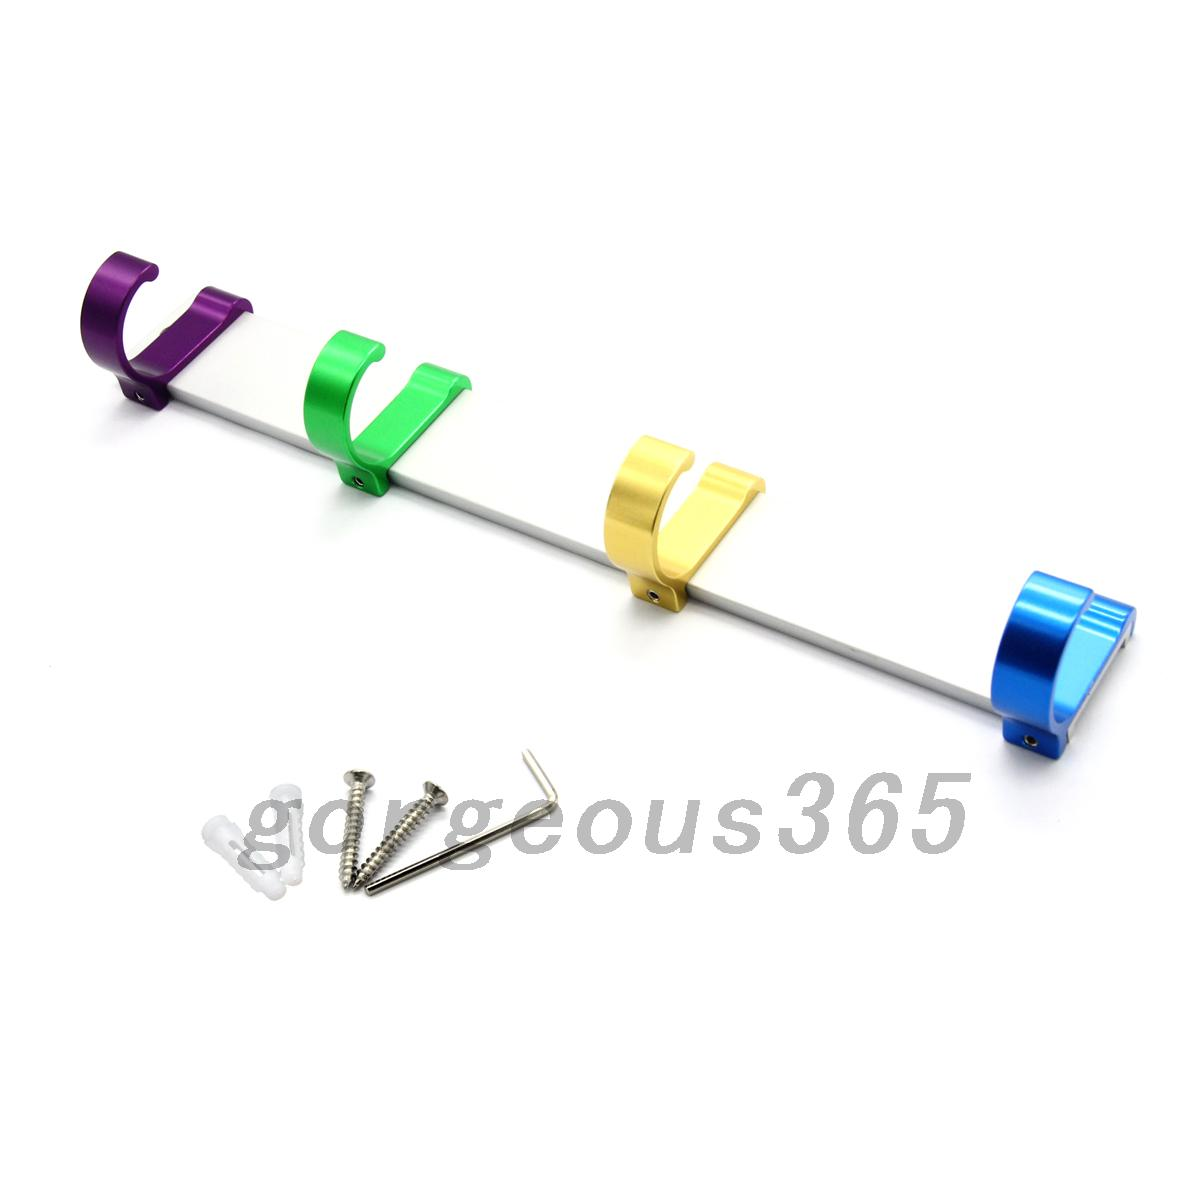 Convenient-Hanger-Bag-Clothes-Creative-Space-Aluminum-Colorful-Single-Row-Hook